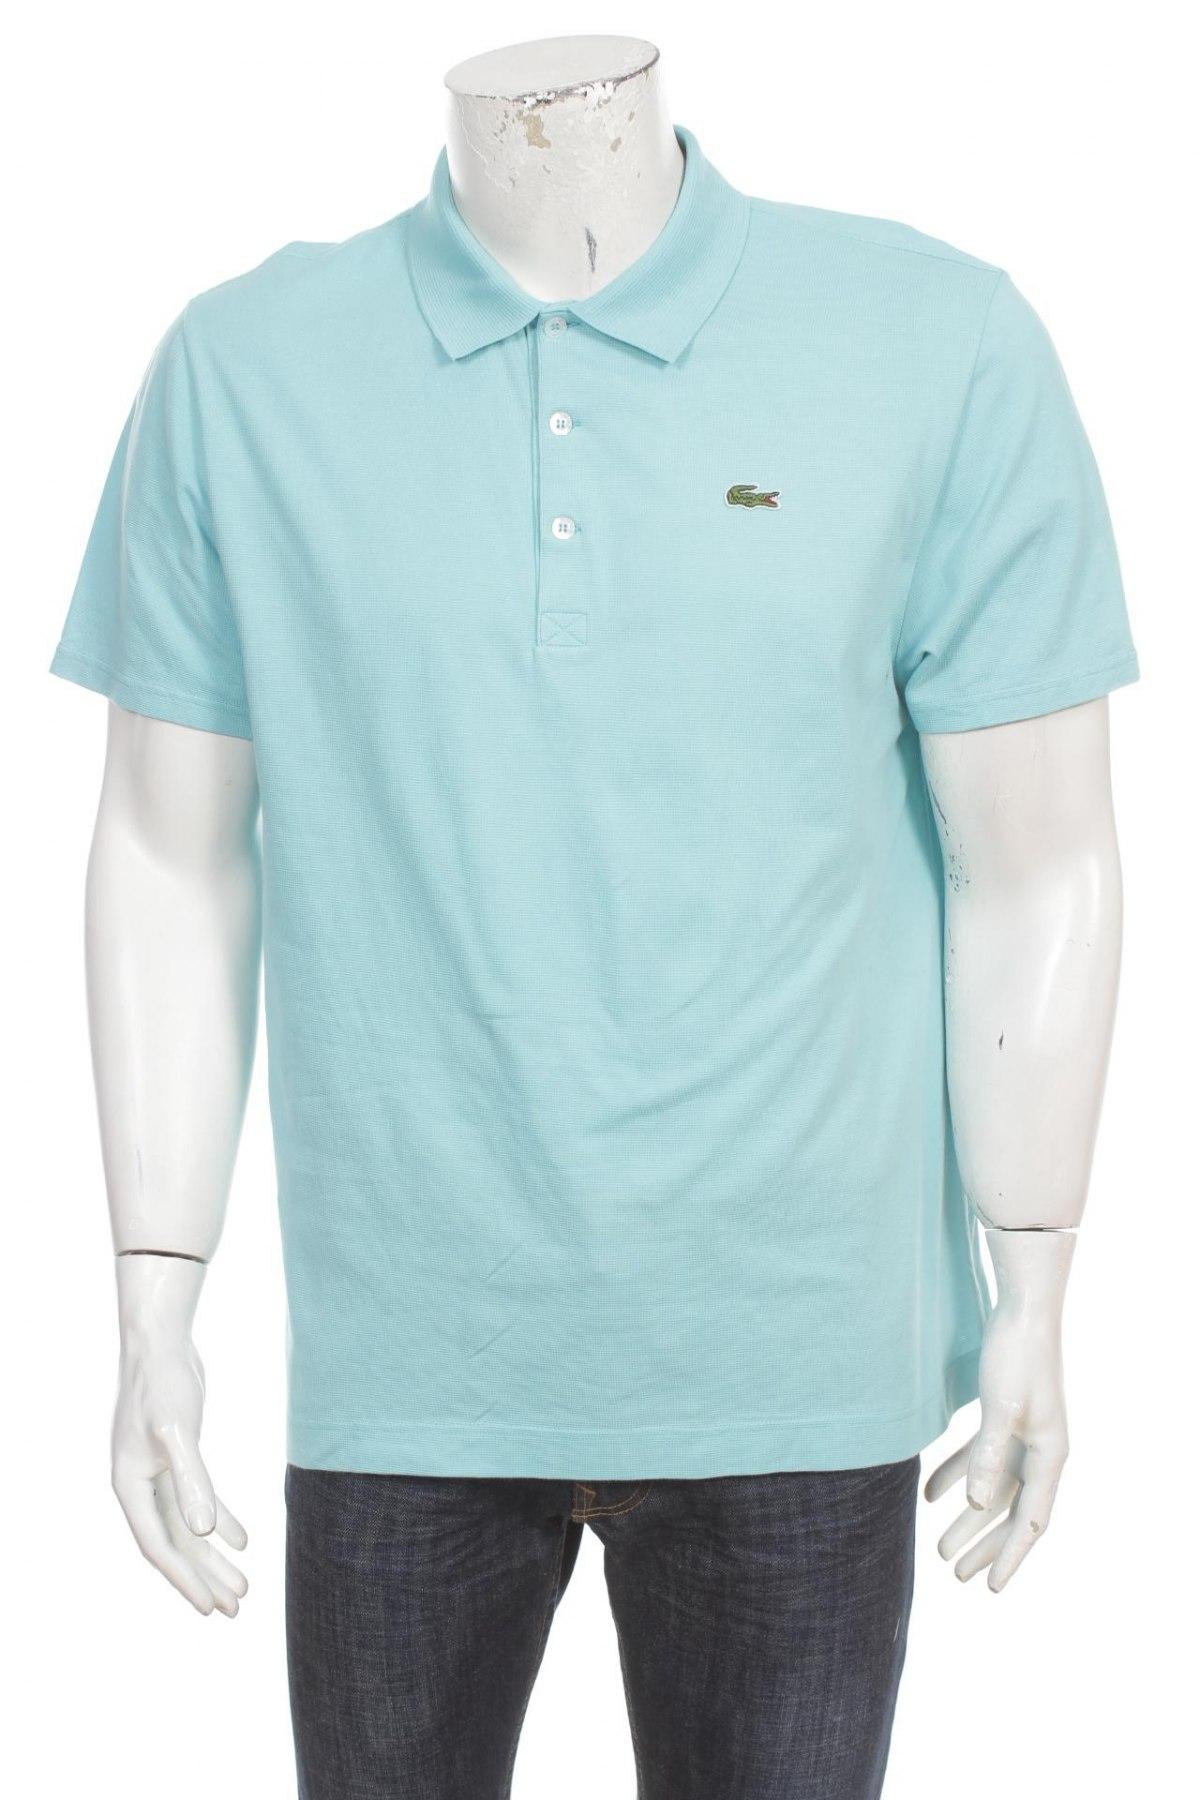 7836bccff05a Ανδρικό t-shirt Lacoste - σε συμφέρουσα τιμή στο Remix -  100627299